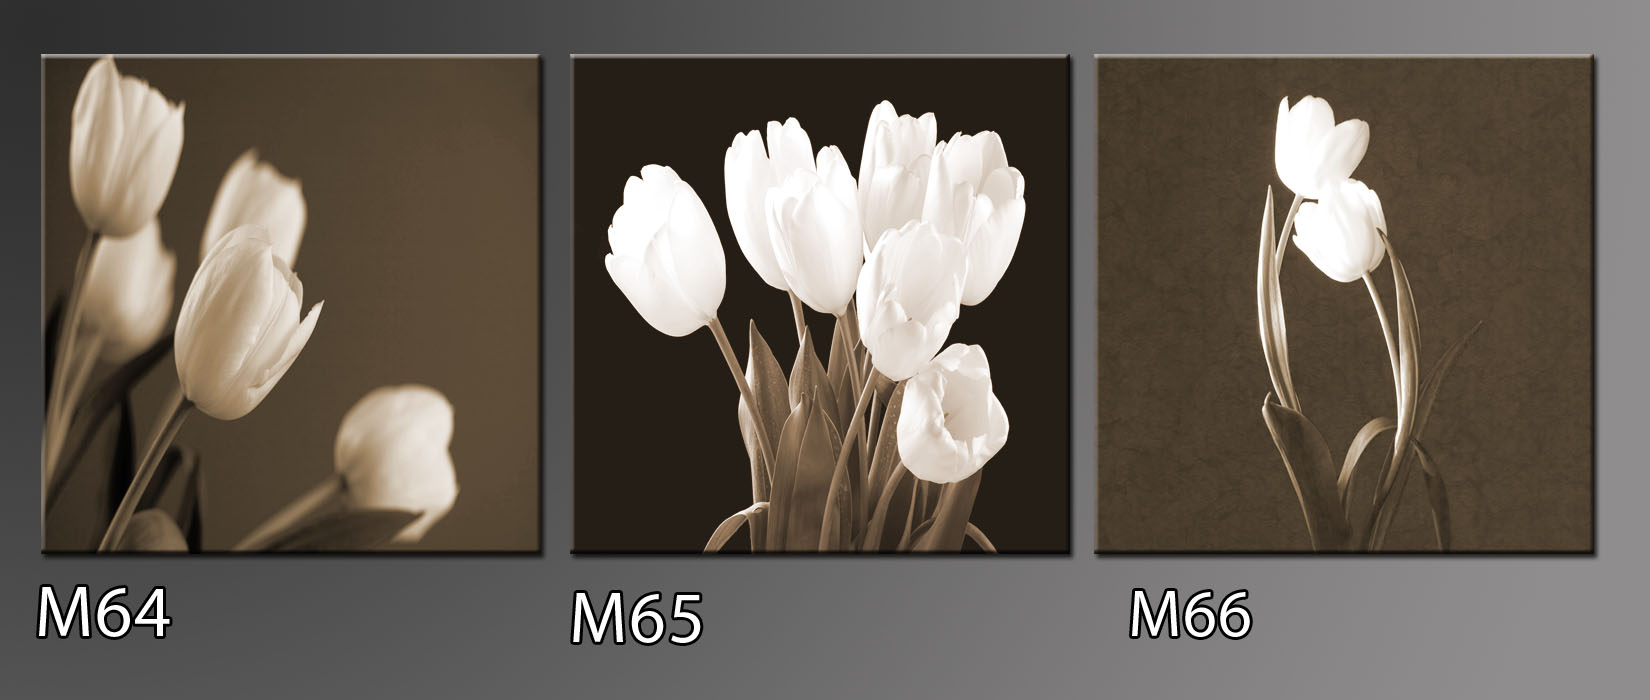 Černobílý obraz tulipánů